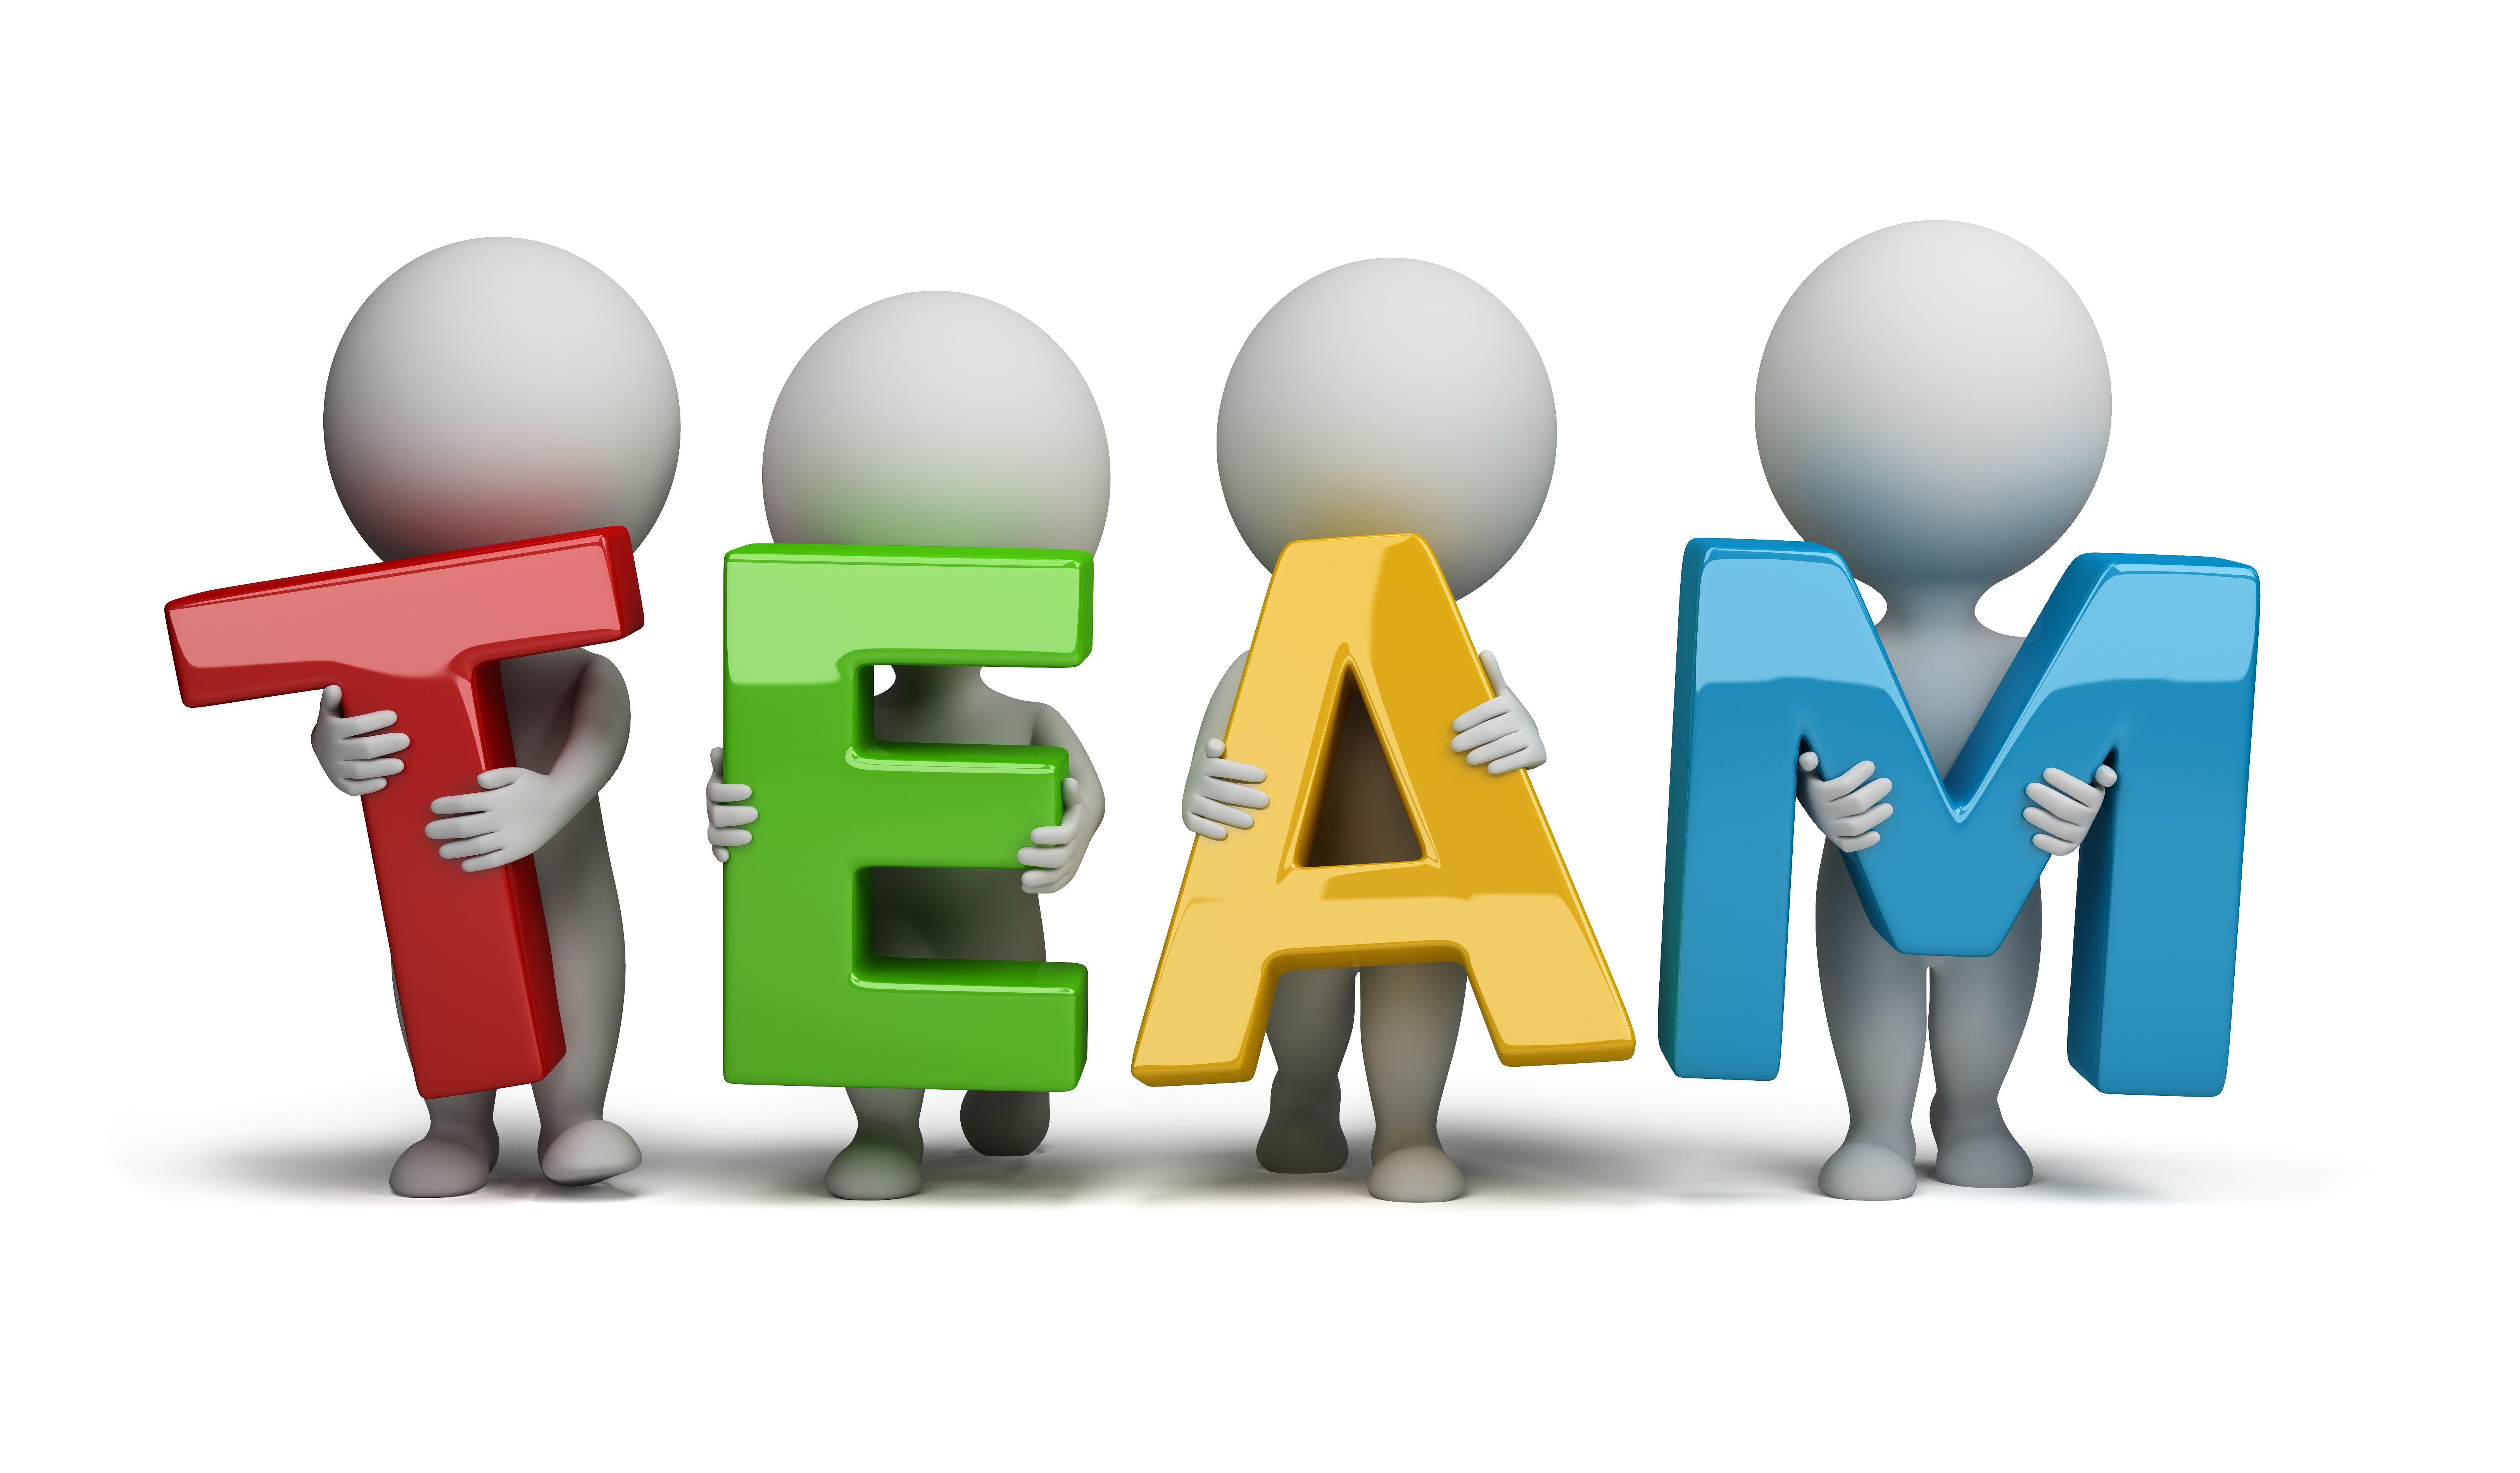 17 Best images about Let's Go TEAM! on Pinterest | Communication ...